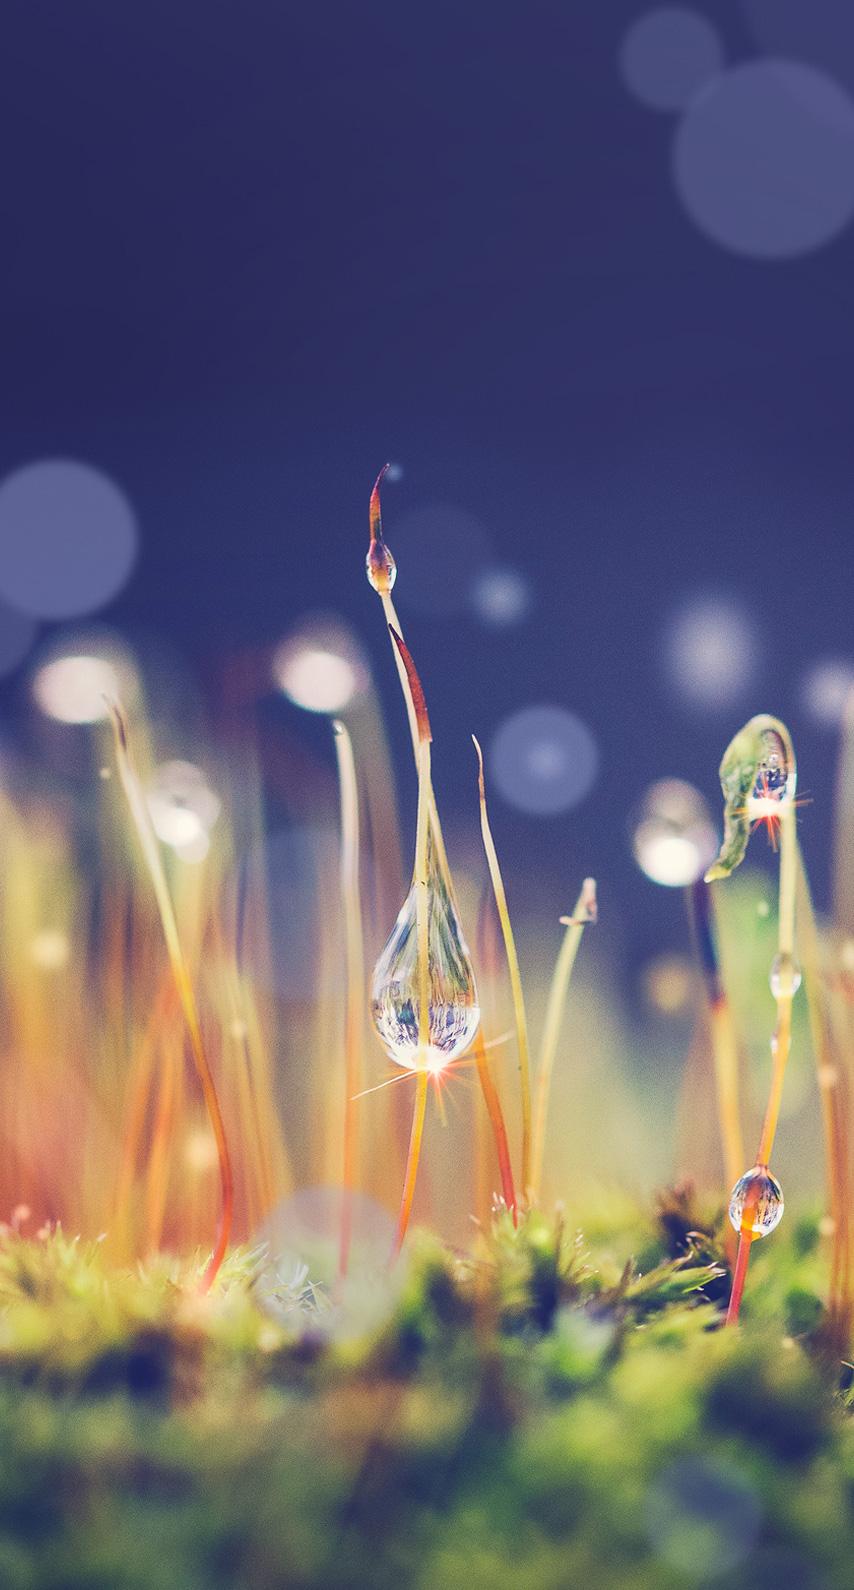 drop, abstract